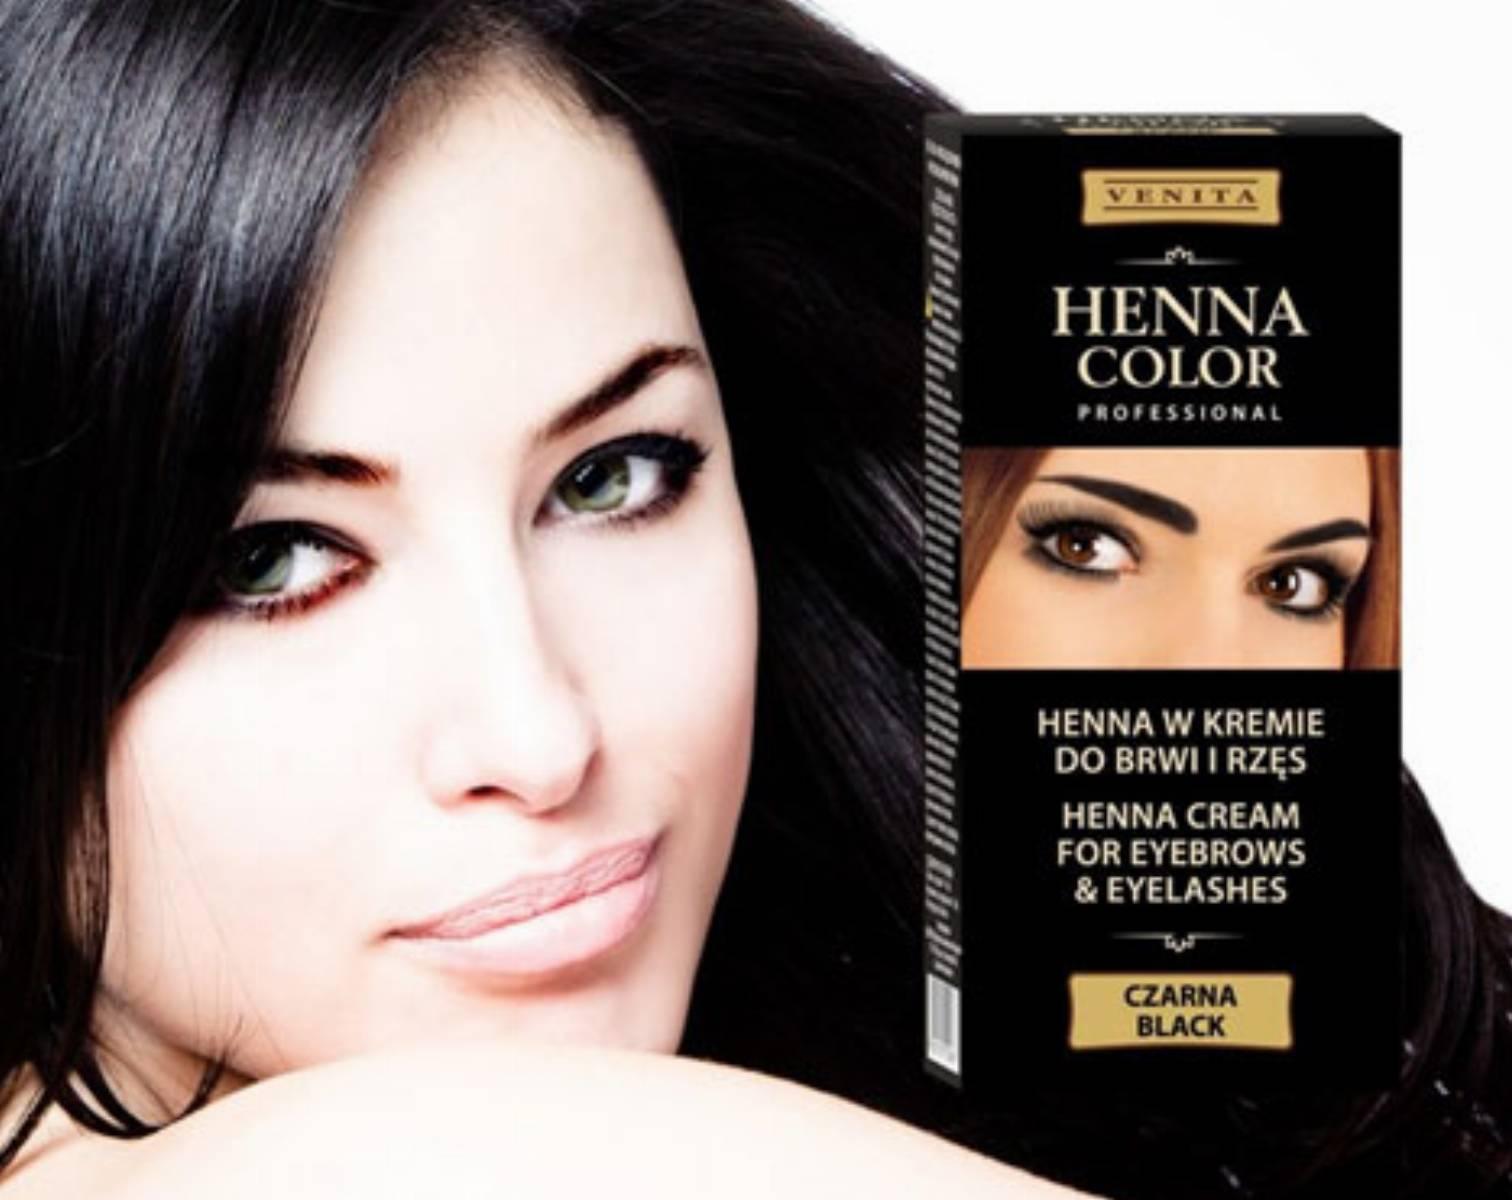 Henna w kremie Venita